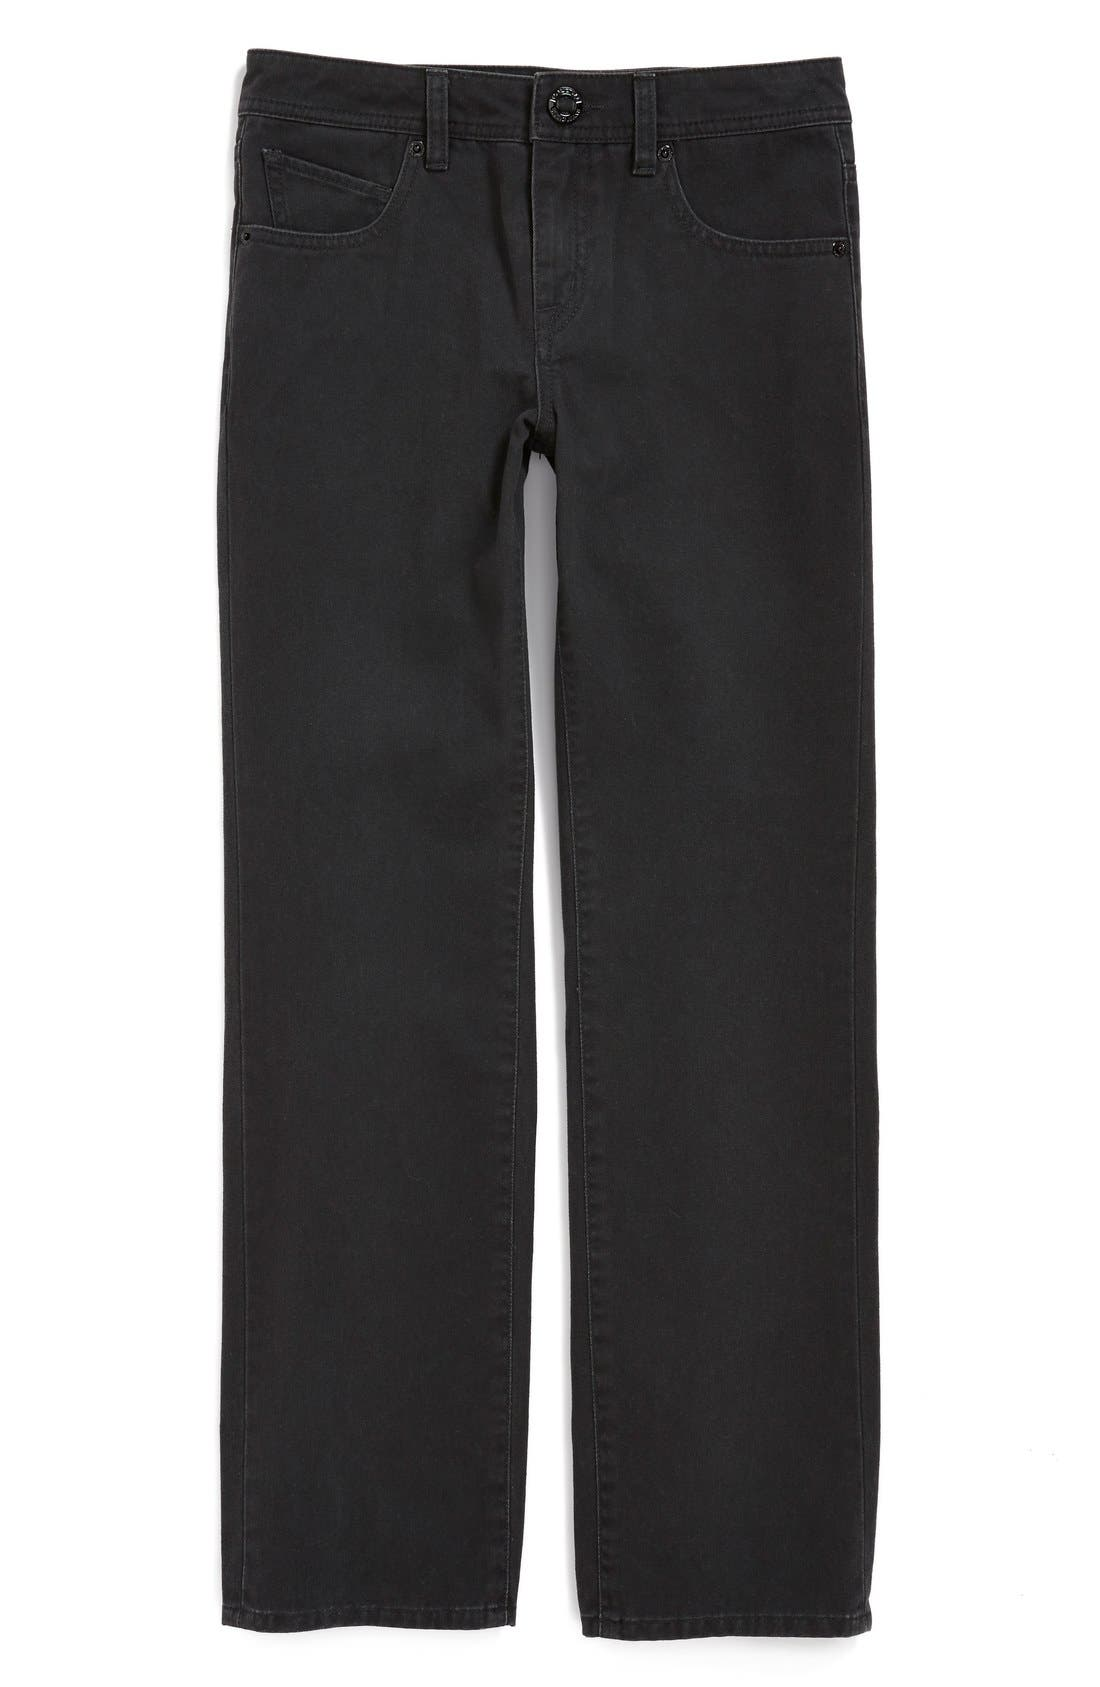 Main Image - Volcom 'Vorta' Slim Straight Leg Cotton Twill Pants (Toddler Boys & Little Boys) (Online Only)